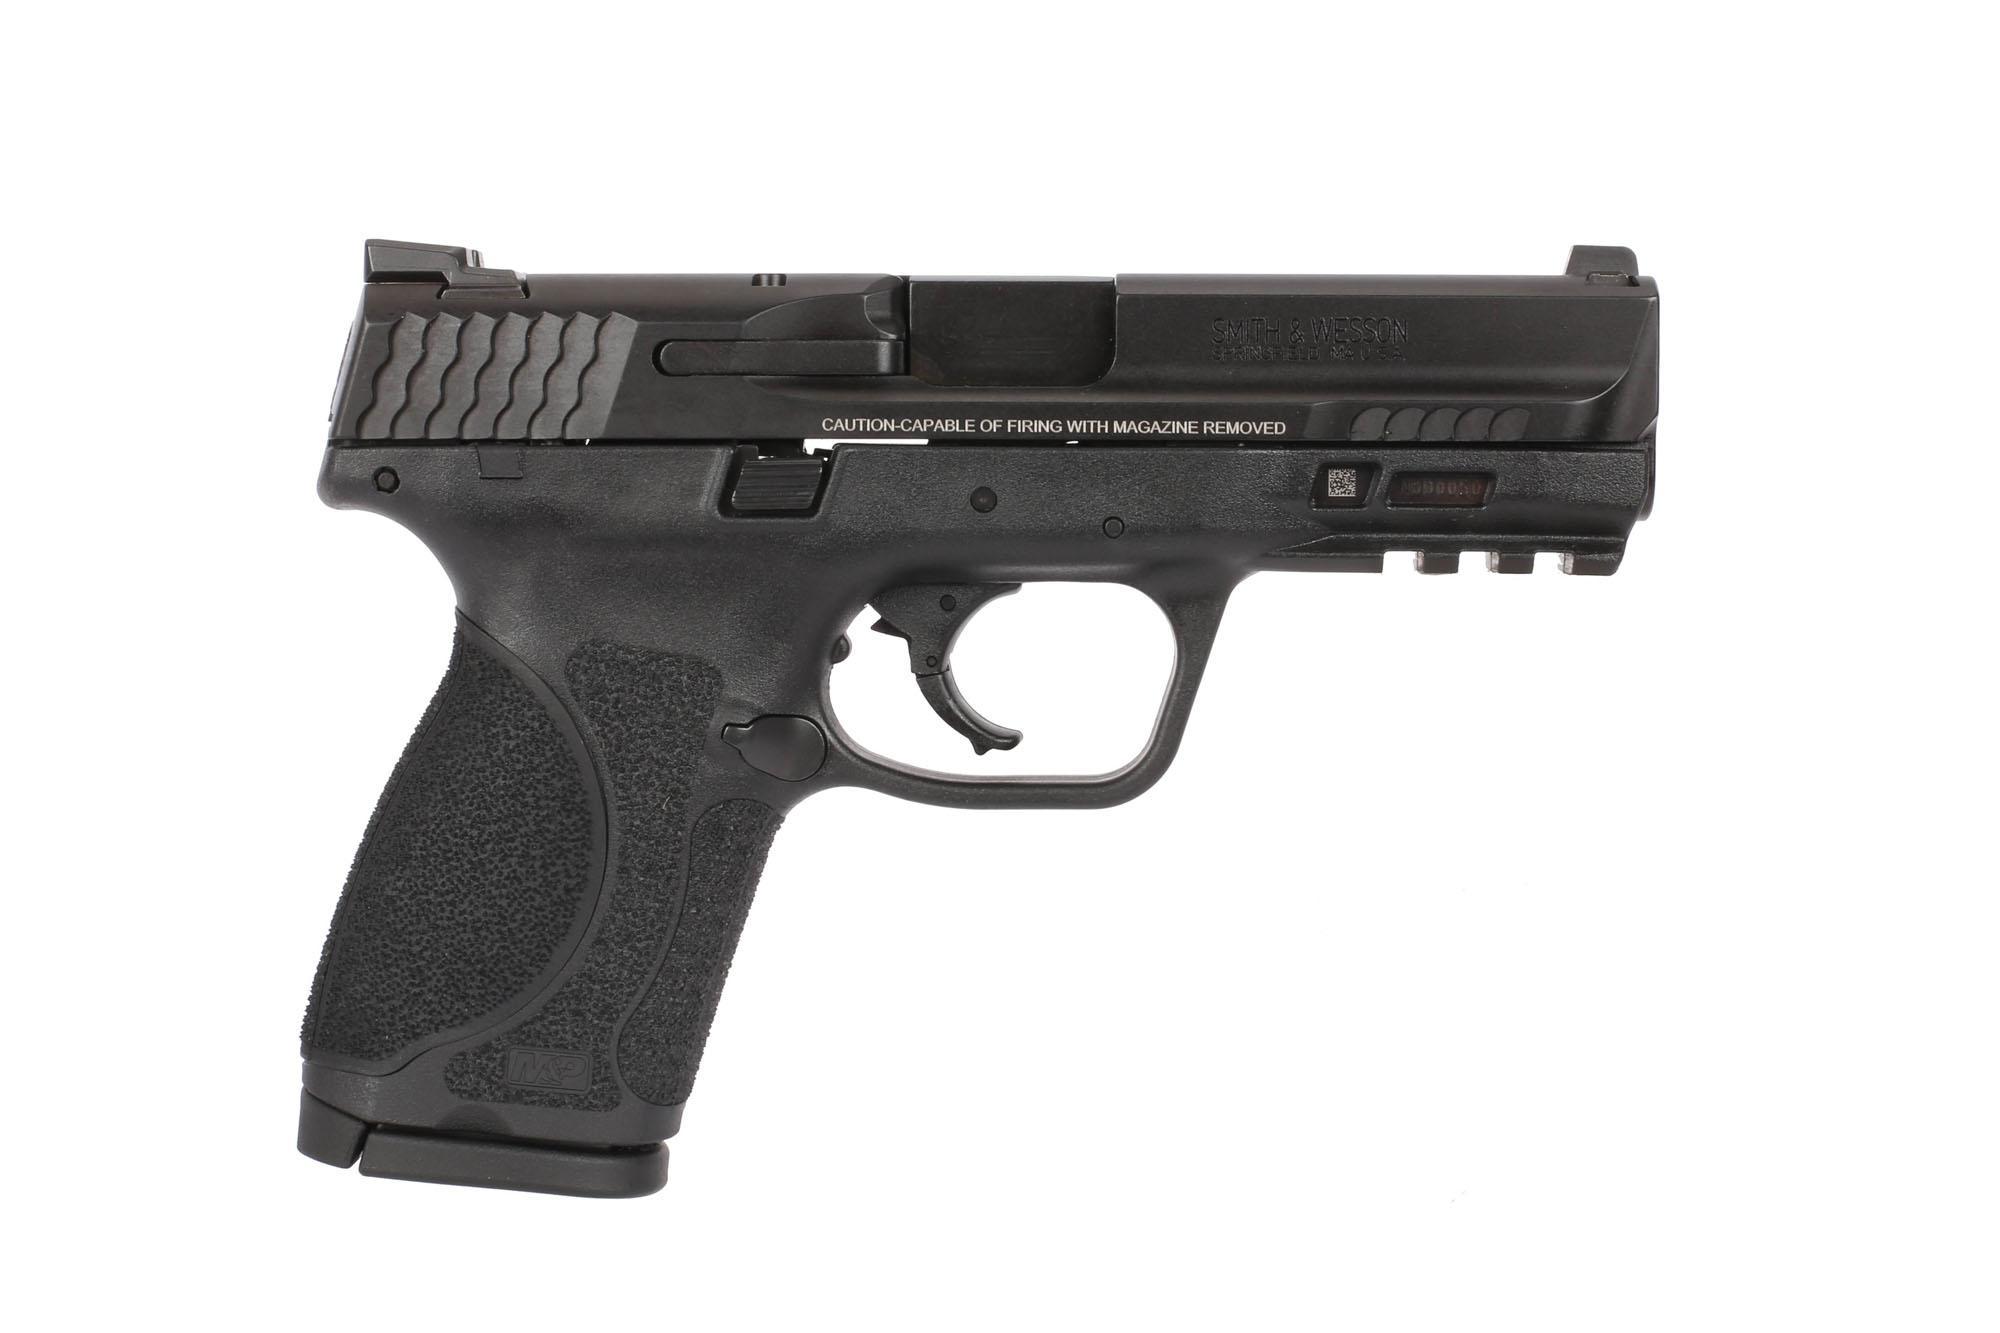 Smith & Wesson M&P9 M2.0 9mm Compact 15rnd Handgun - 4\